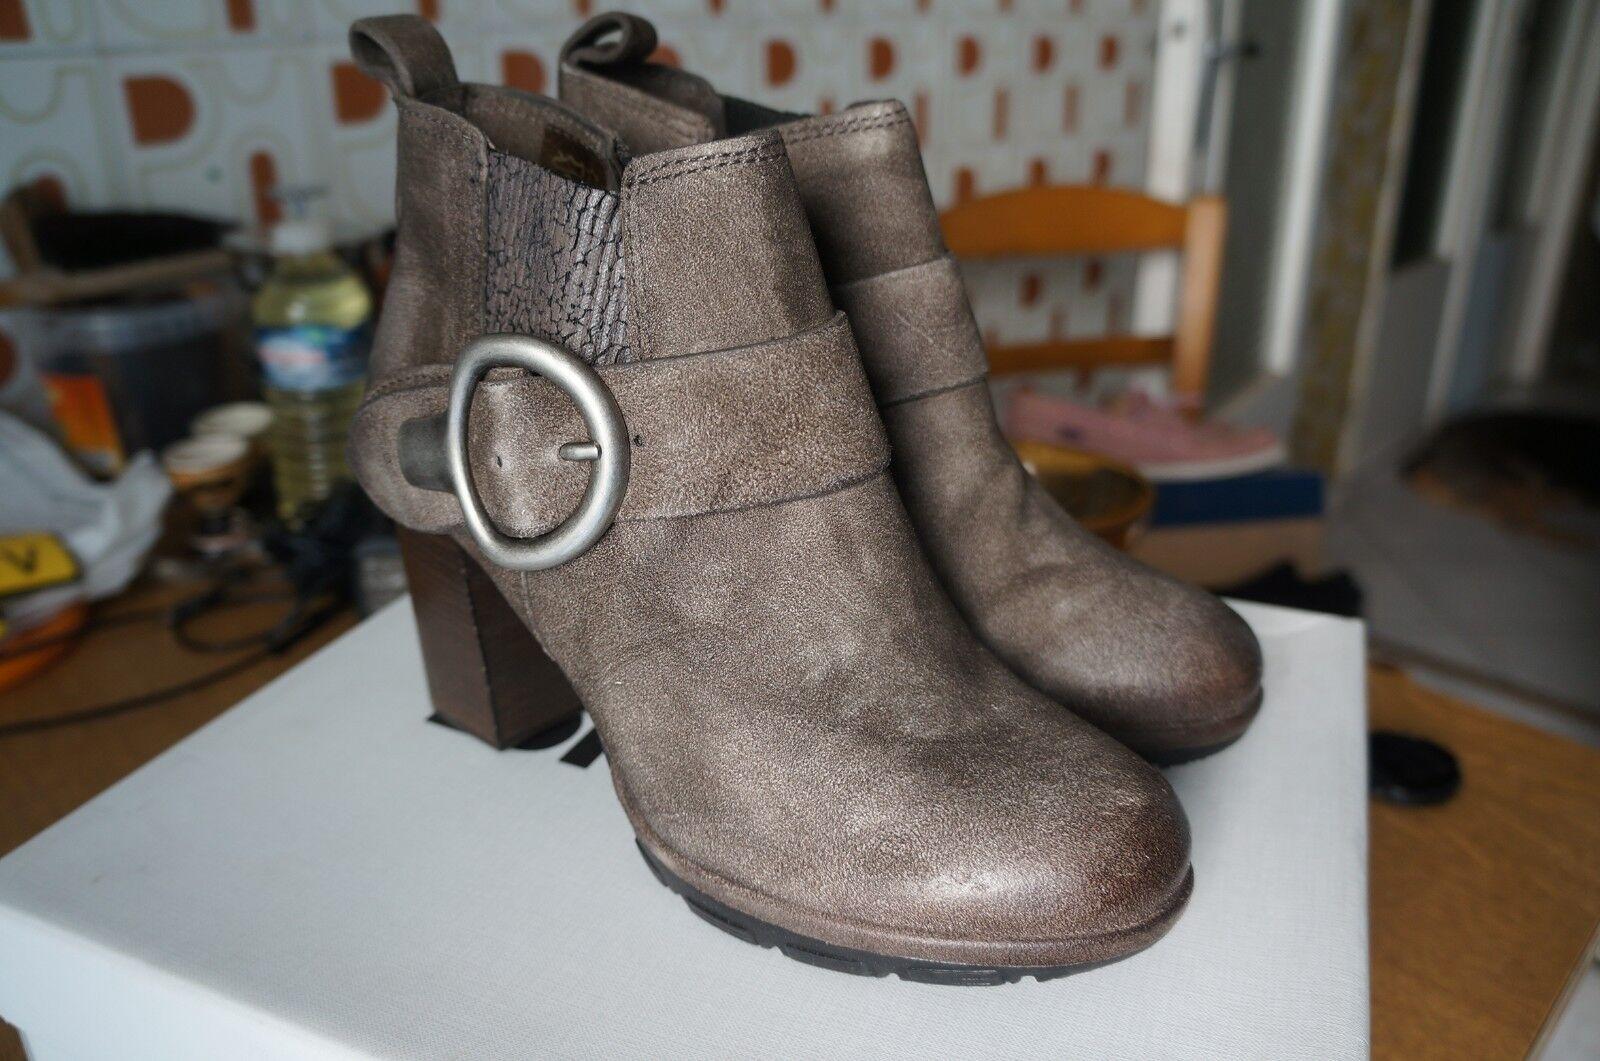 Zapatos especiales con descuento Mjus Damen 183202-0101-6321 Kurzschaft Stiefel, Grau (Pepe), 37 EUùùùùùùùùùùùùù